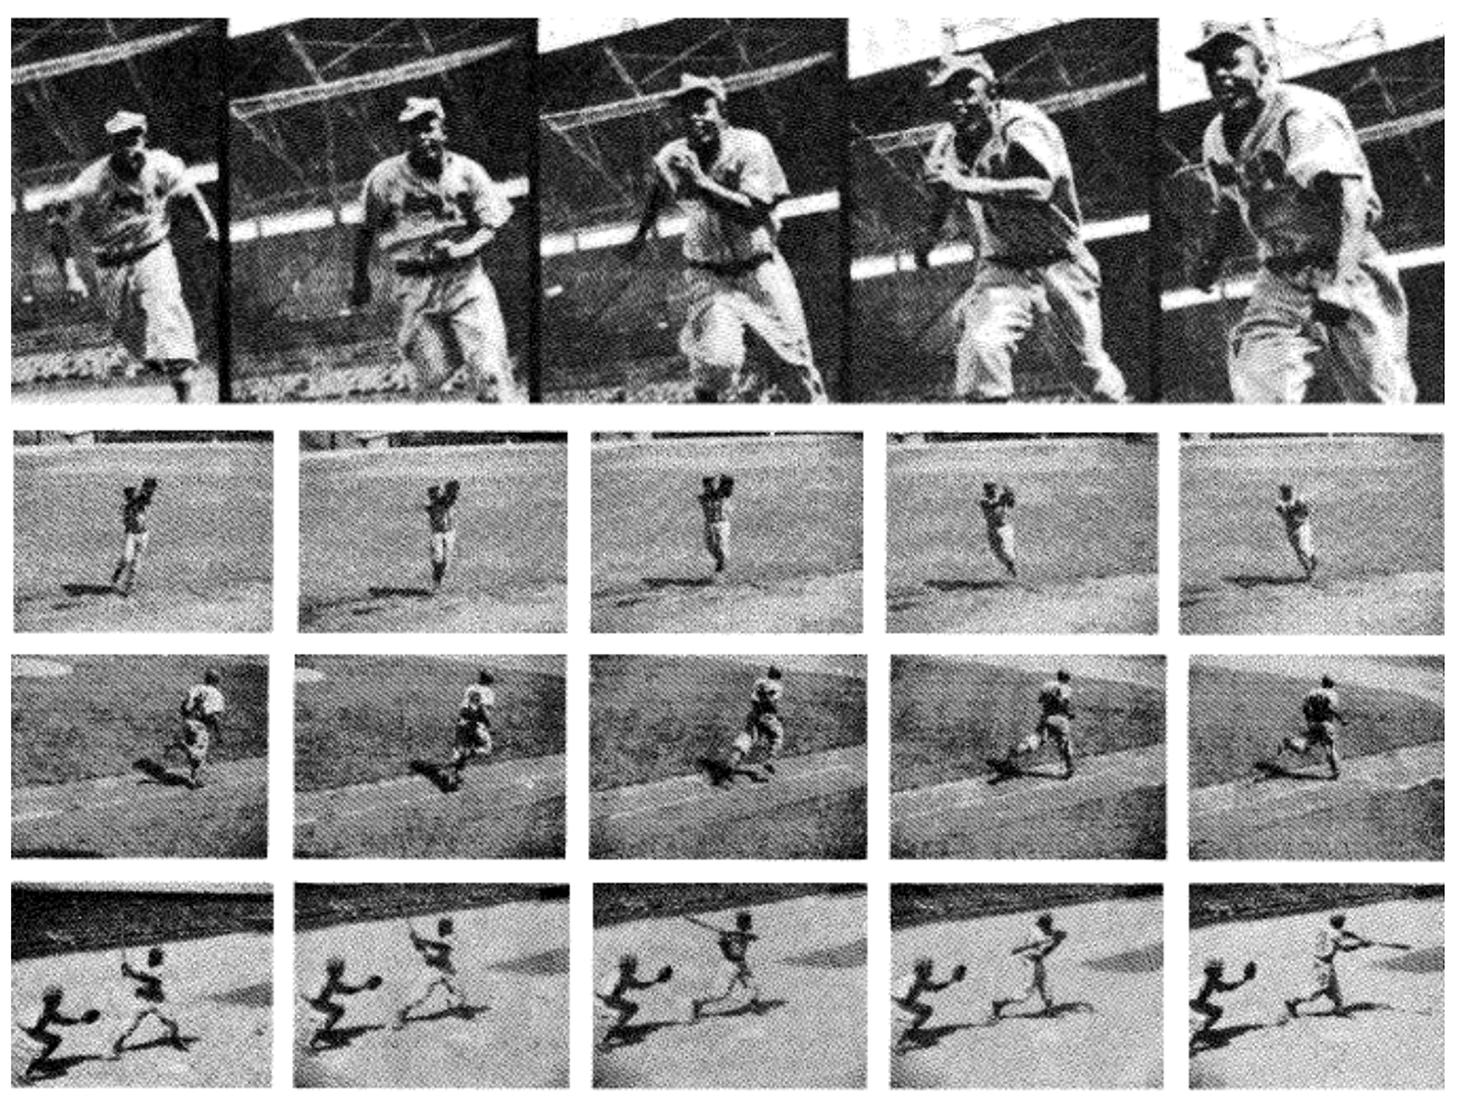 Terrell photographs of Jackie Robinson, October 7, 1945. (COURTESY OF JOHN THORN)